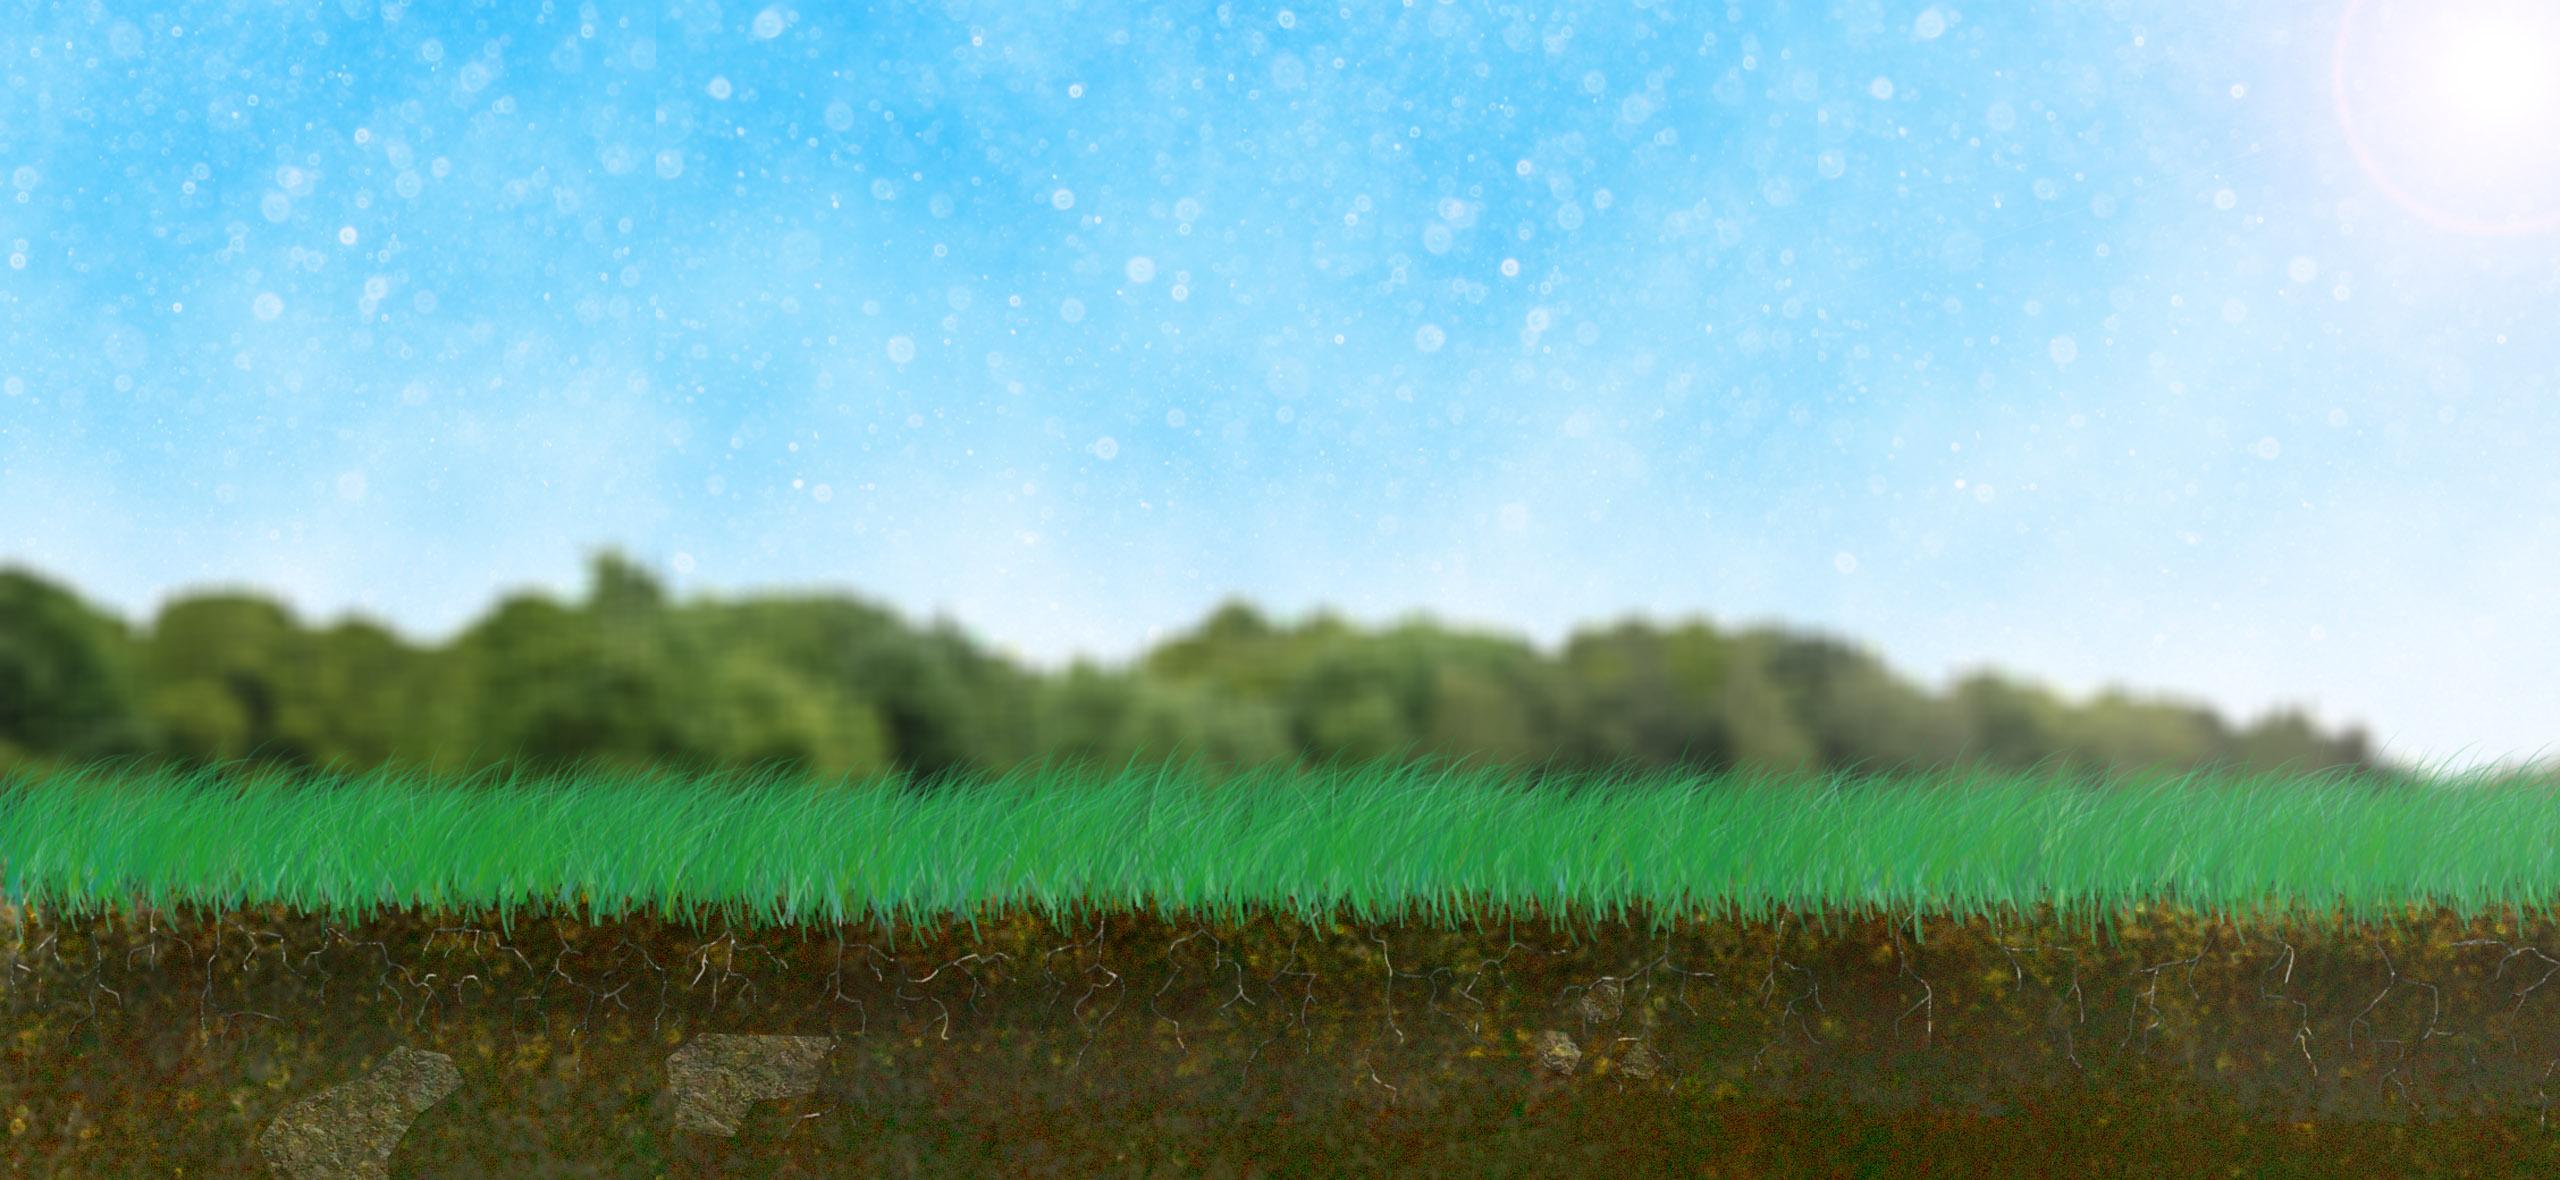 Creative environments landscape co edible gardens - Creative Environments Landscape Co Edible Gardens 5